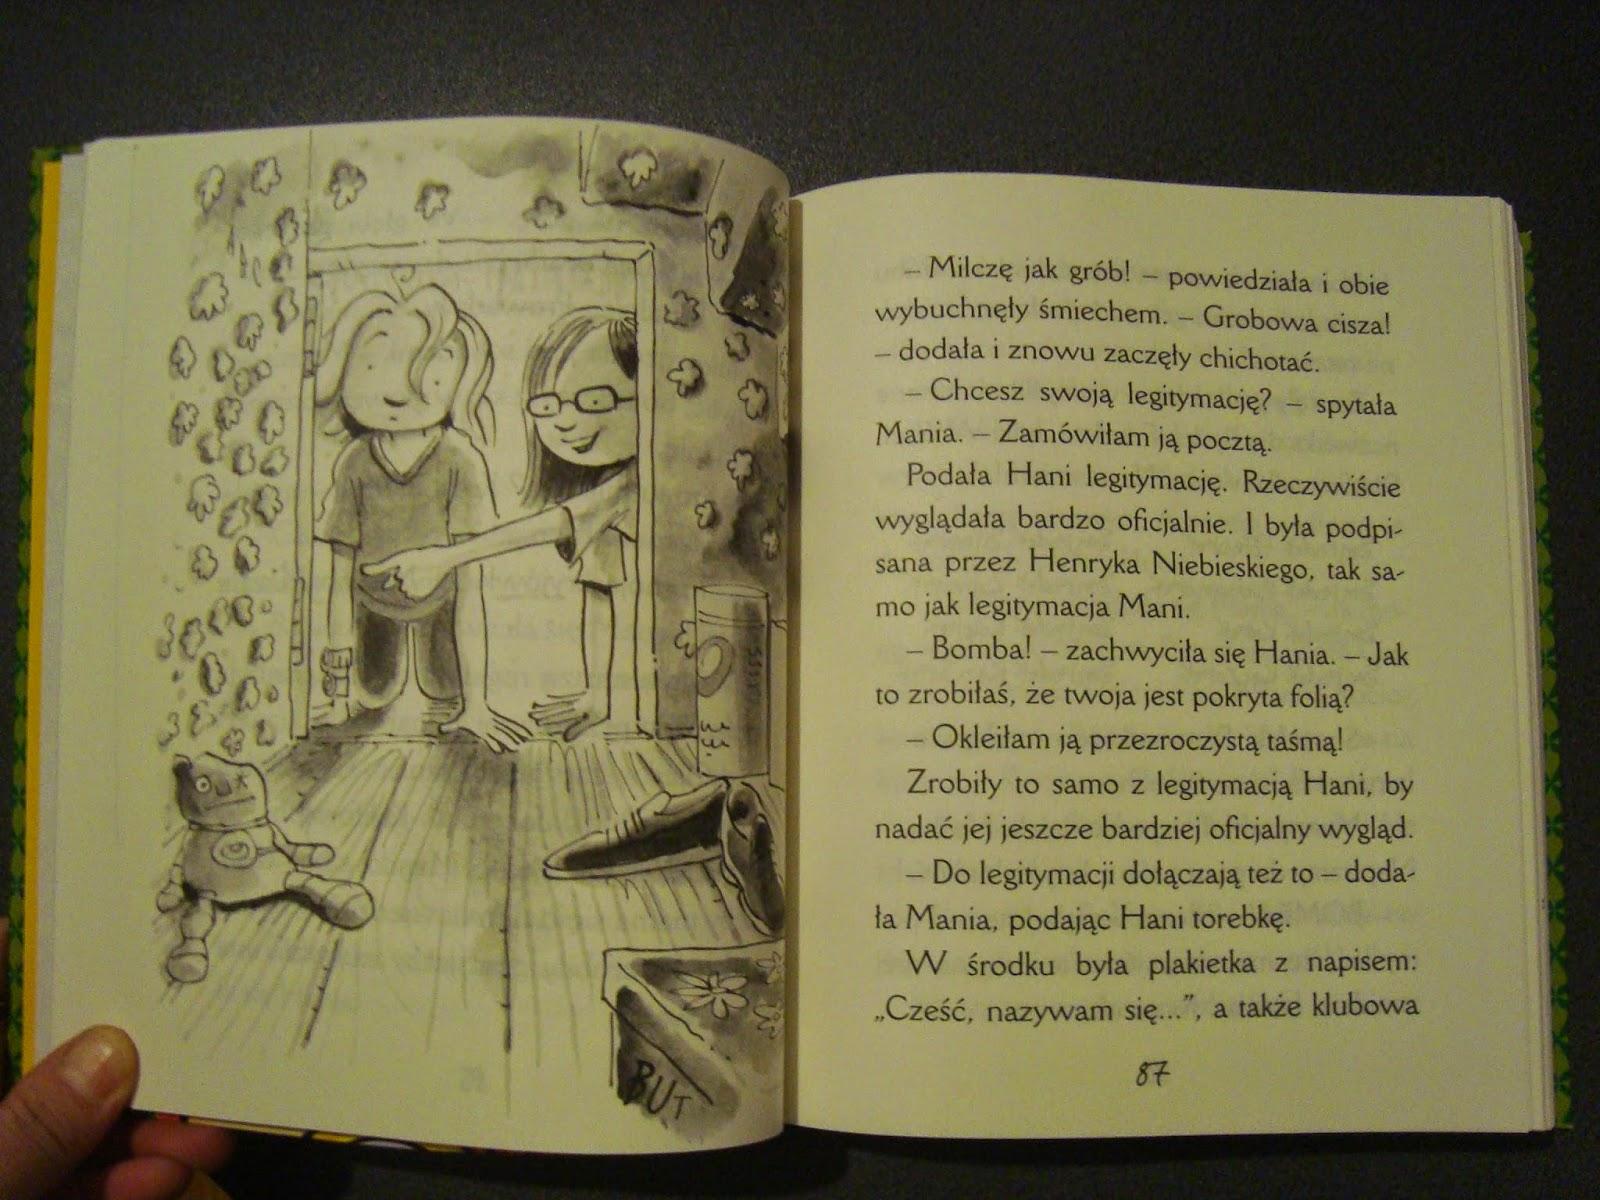 Wielka księga humoru. Hania Humorek. Egmont, recenzja